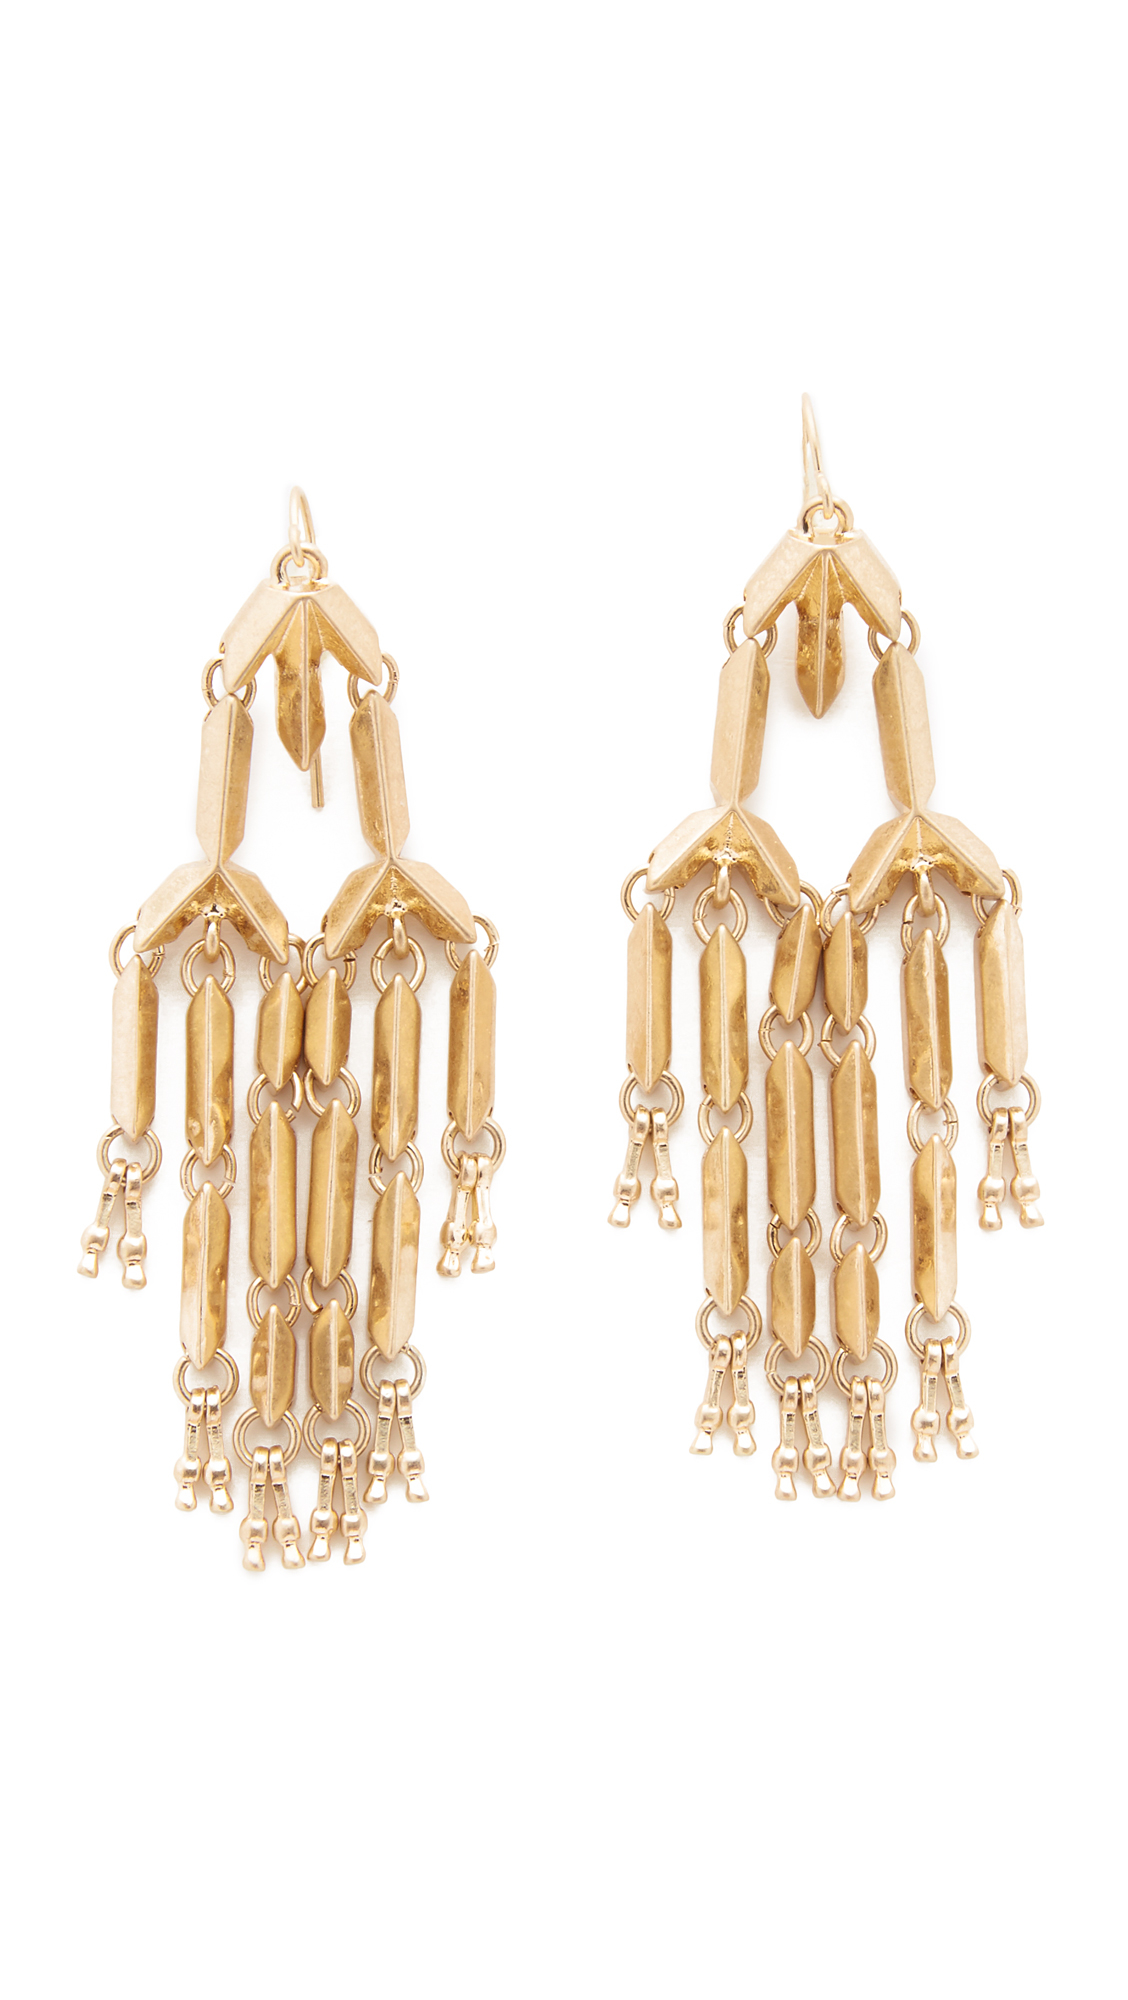 Adia kibur Olivia Chandelier Earrings in Metallic